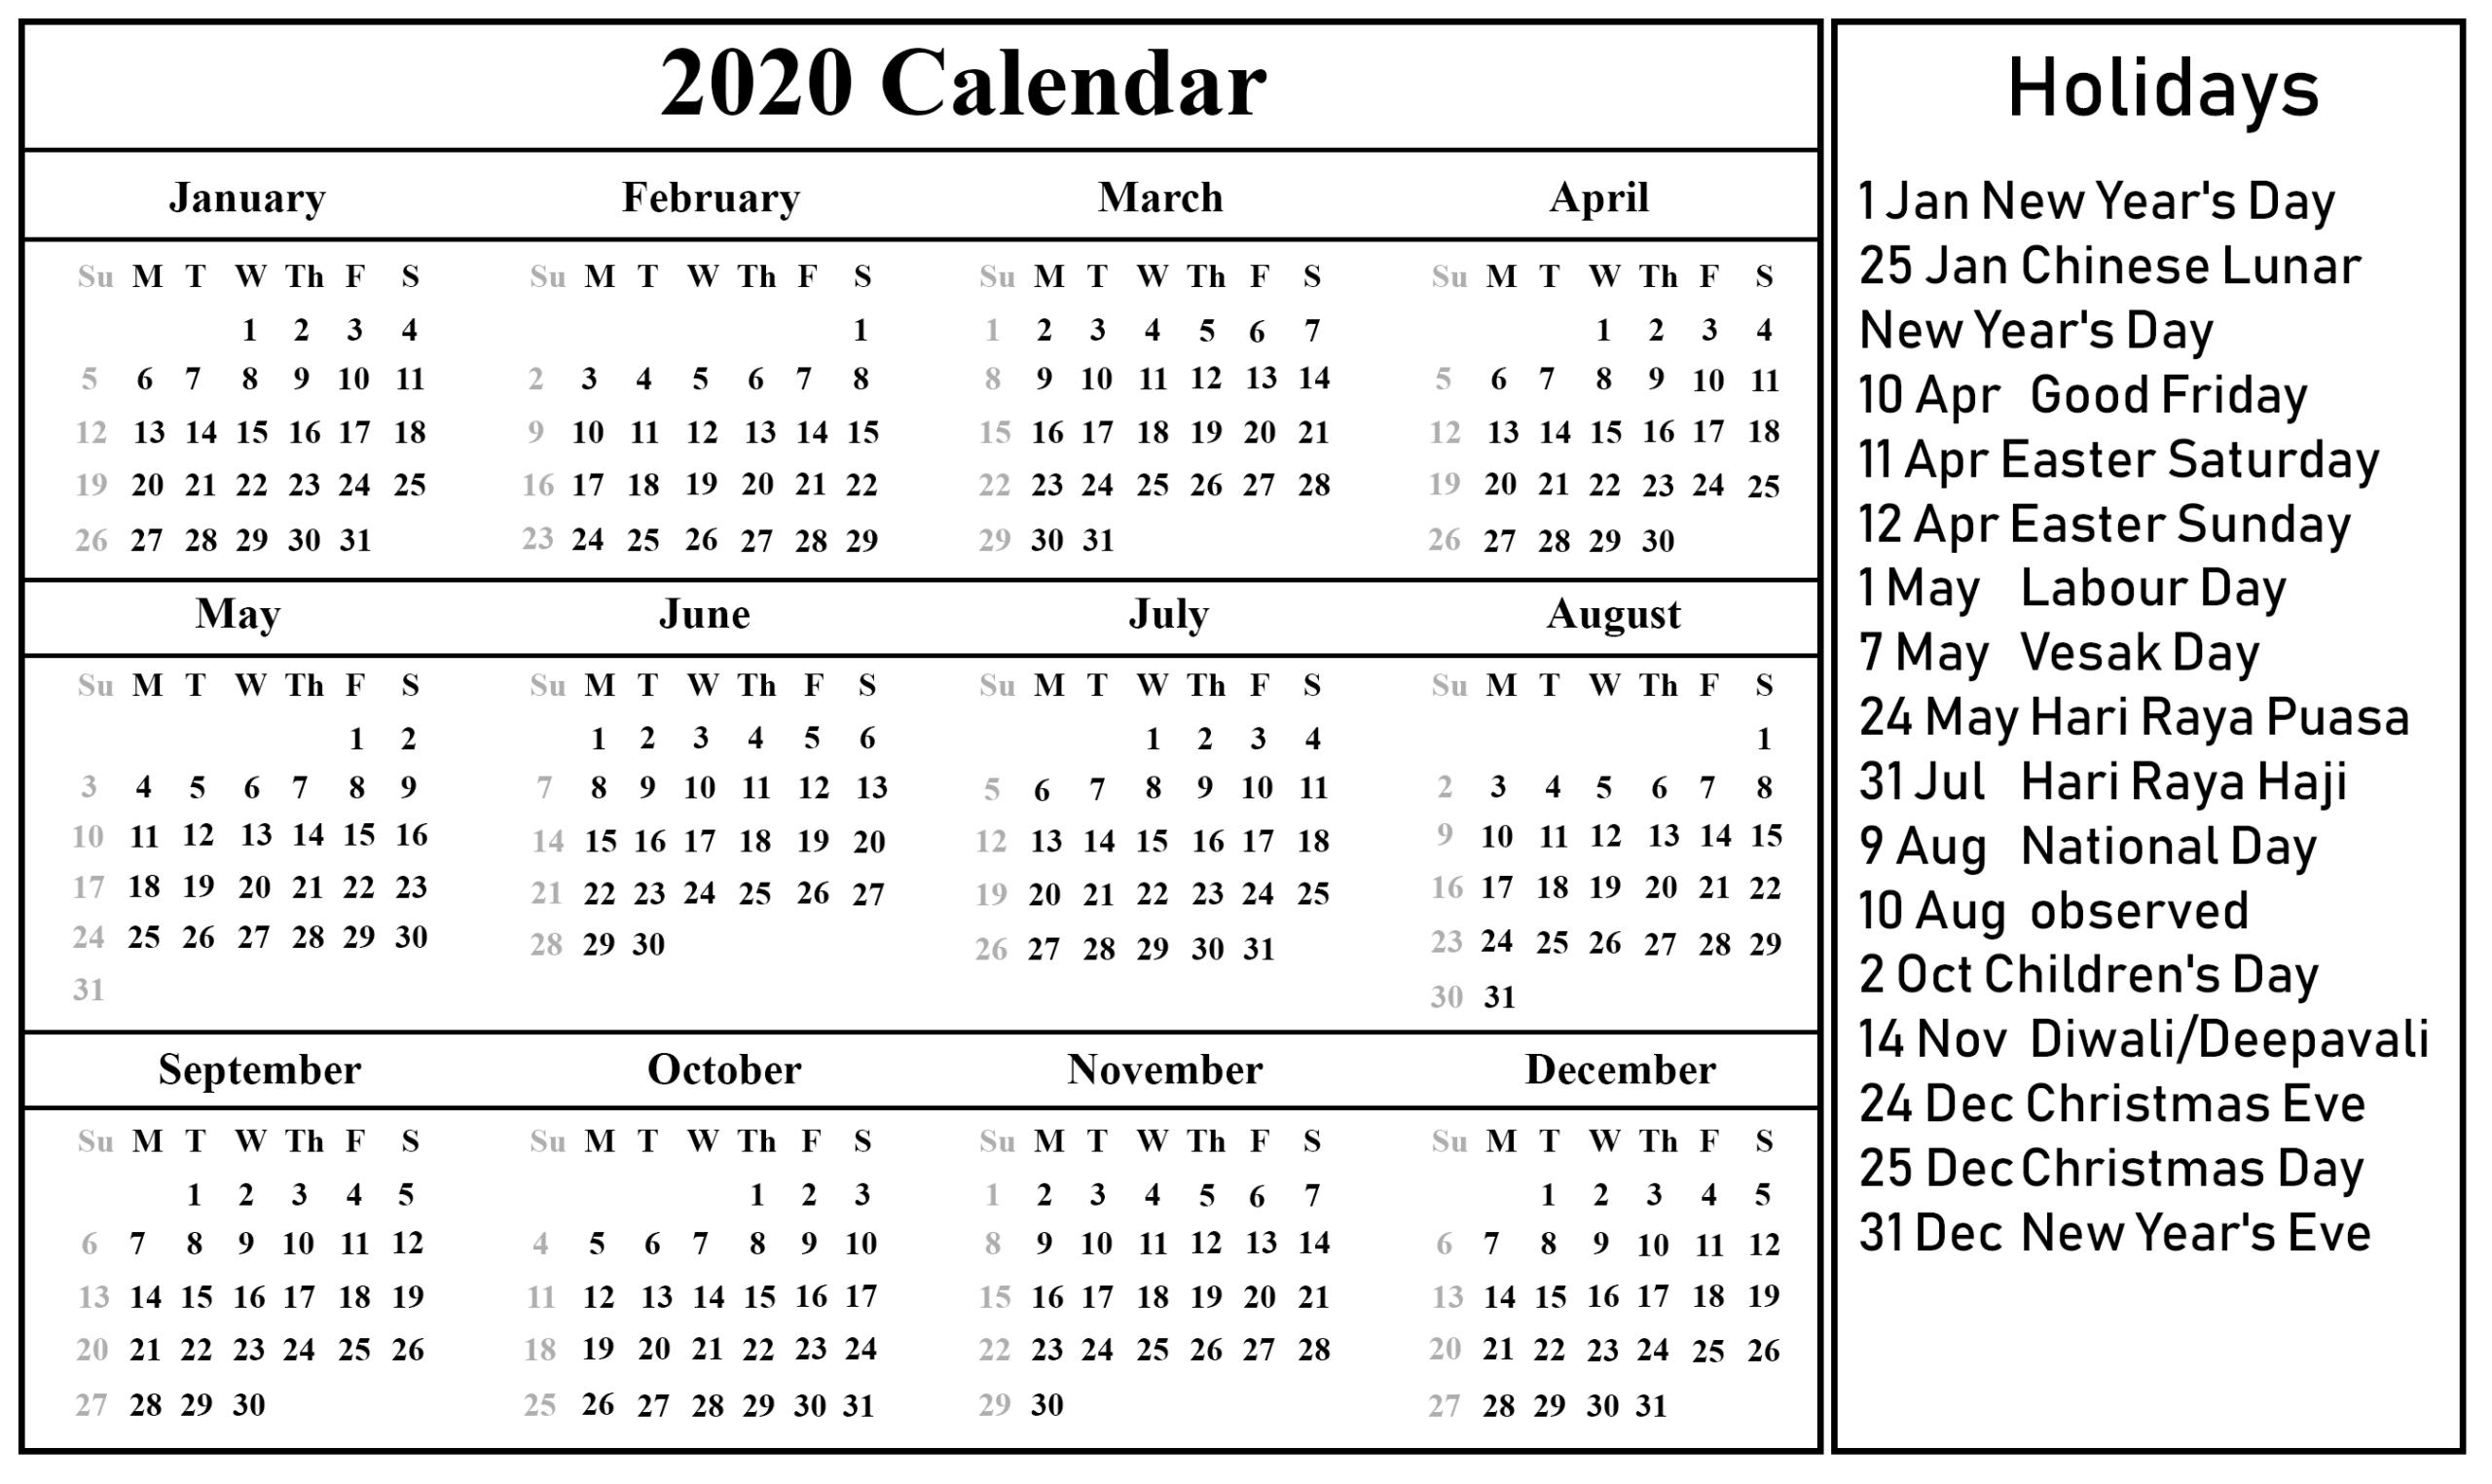 Free Blank Singapore Calendar 2020 In Pdf, Excel & Word Format